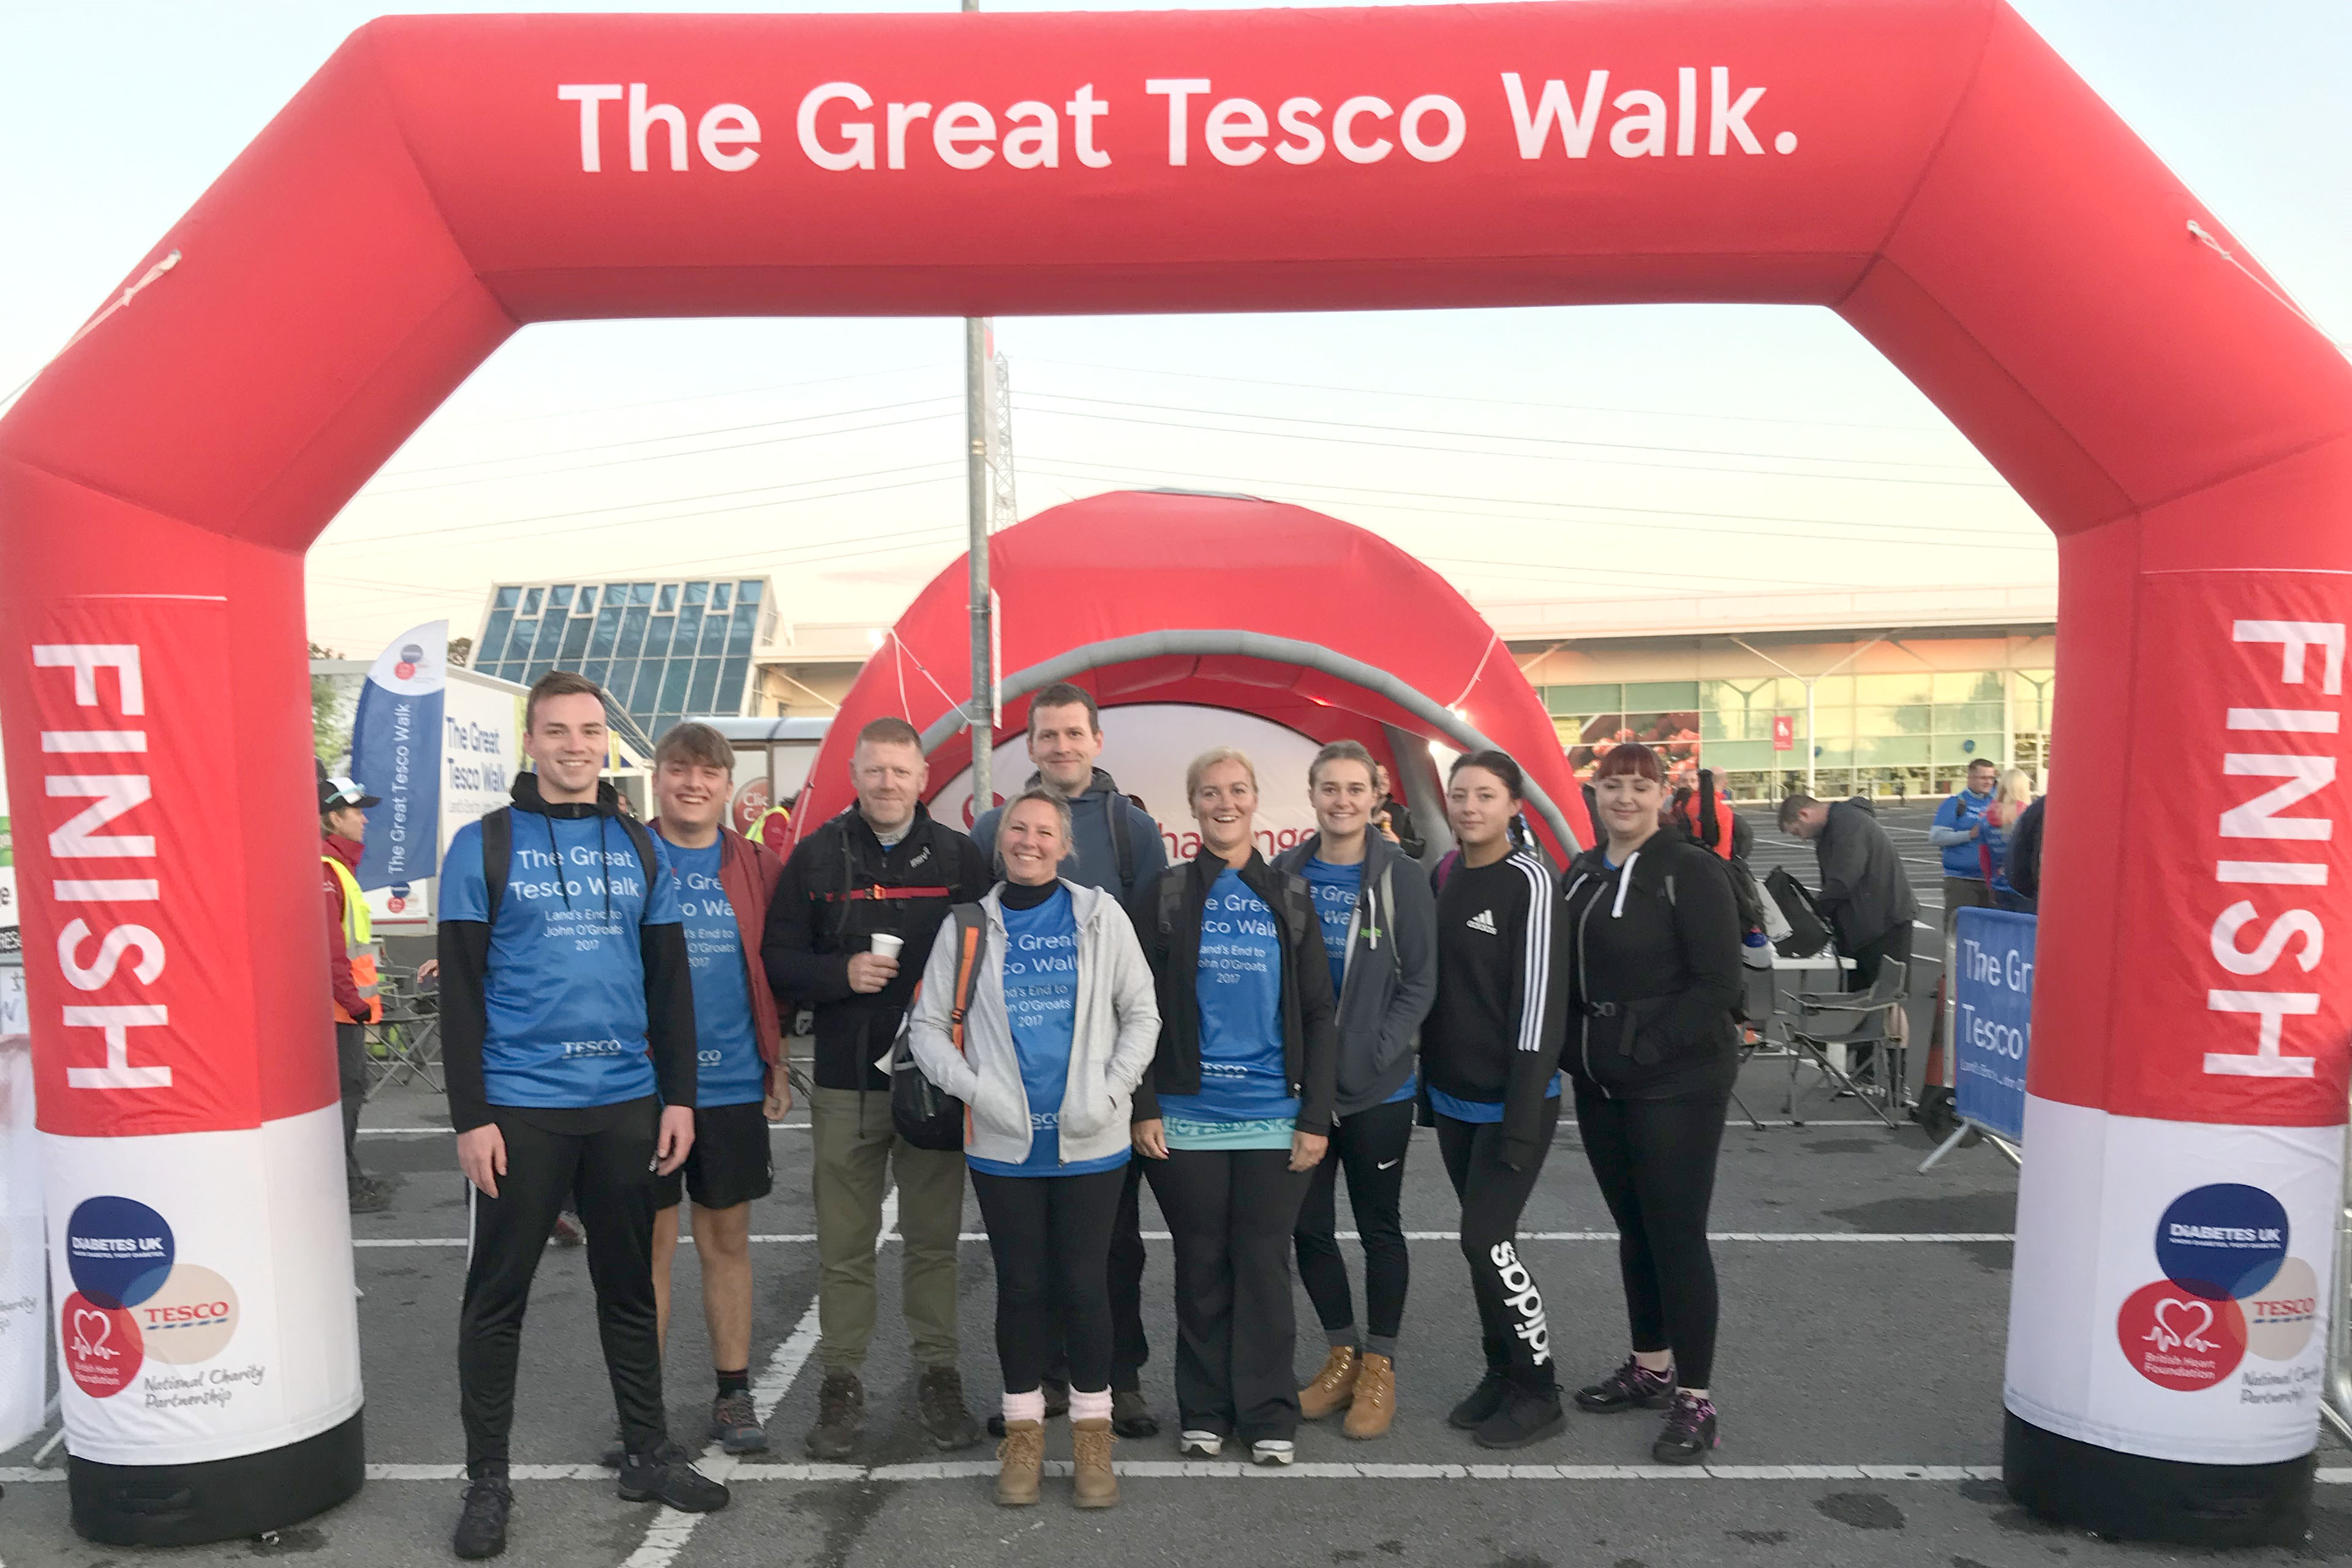 Tesco Staff Walk for Charity